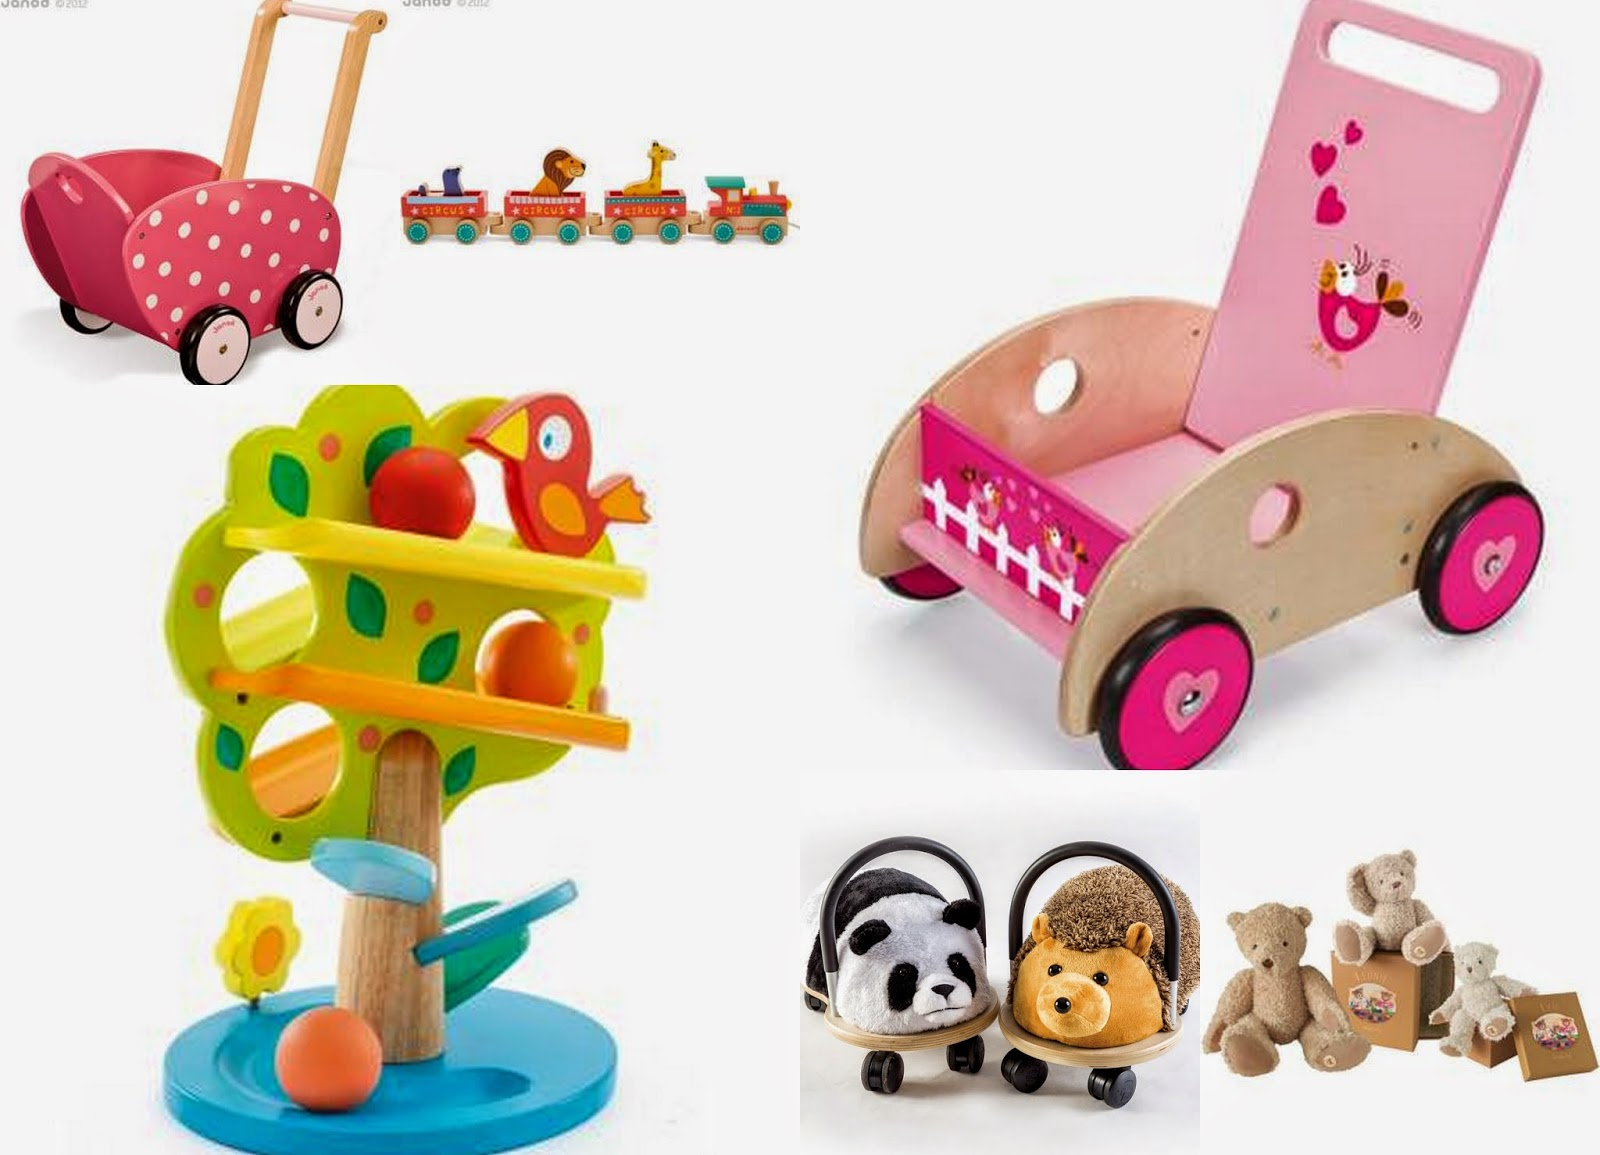 db115751df2f2d Category: speelgoed Tags: speelgoed baby 6-9 maanden ...